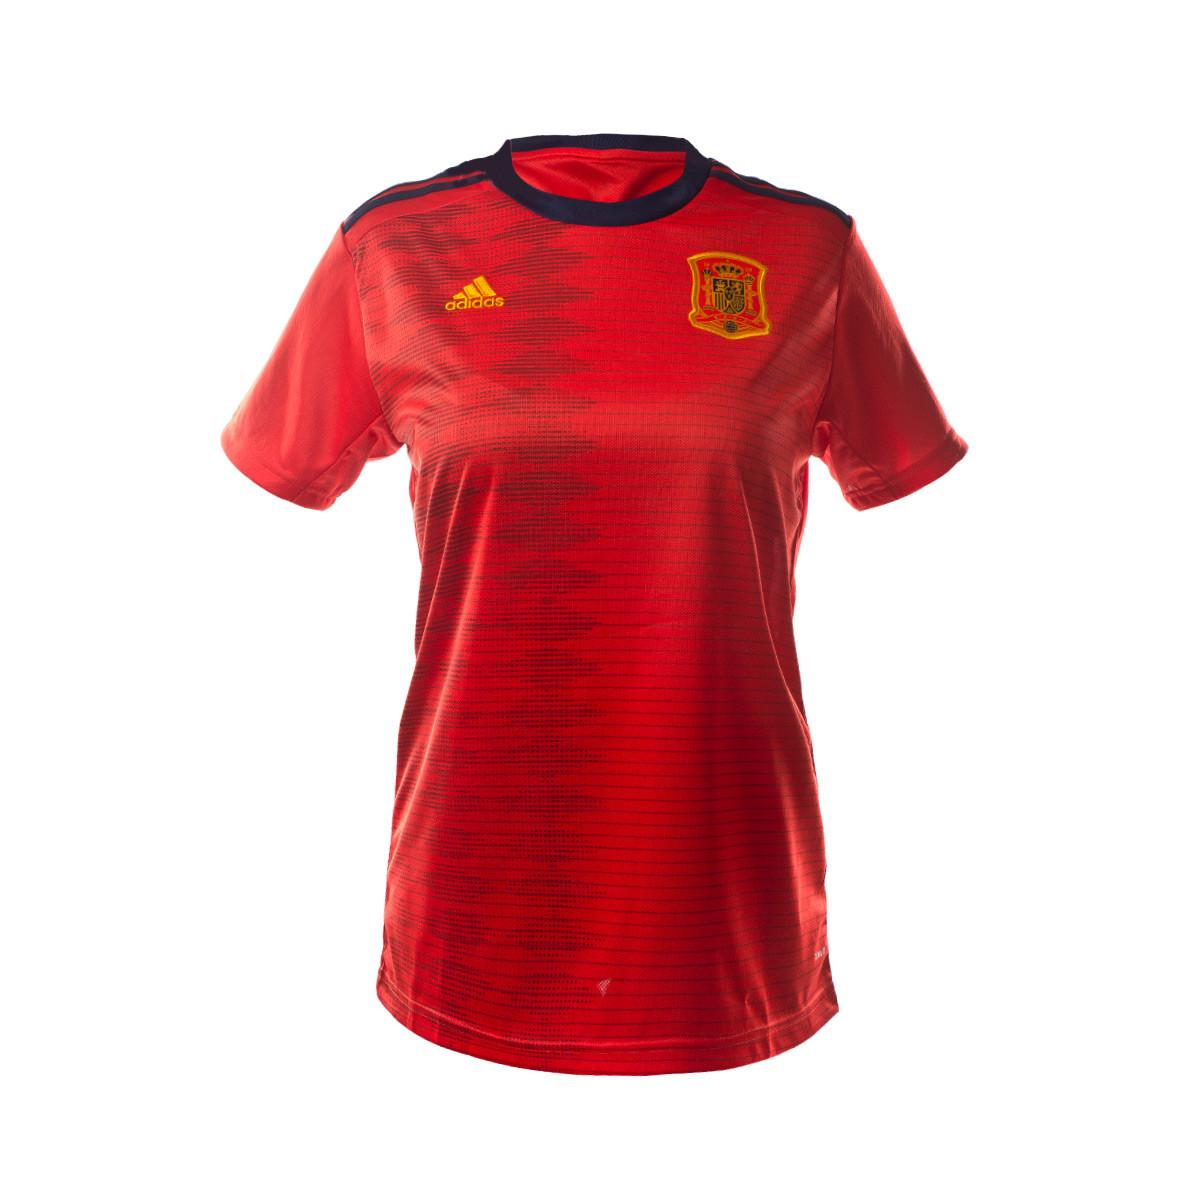 España Equipación Wwc Camiseta 2019 Mujer Primera Red ymw8nvN0O